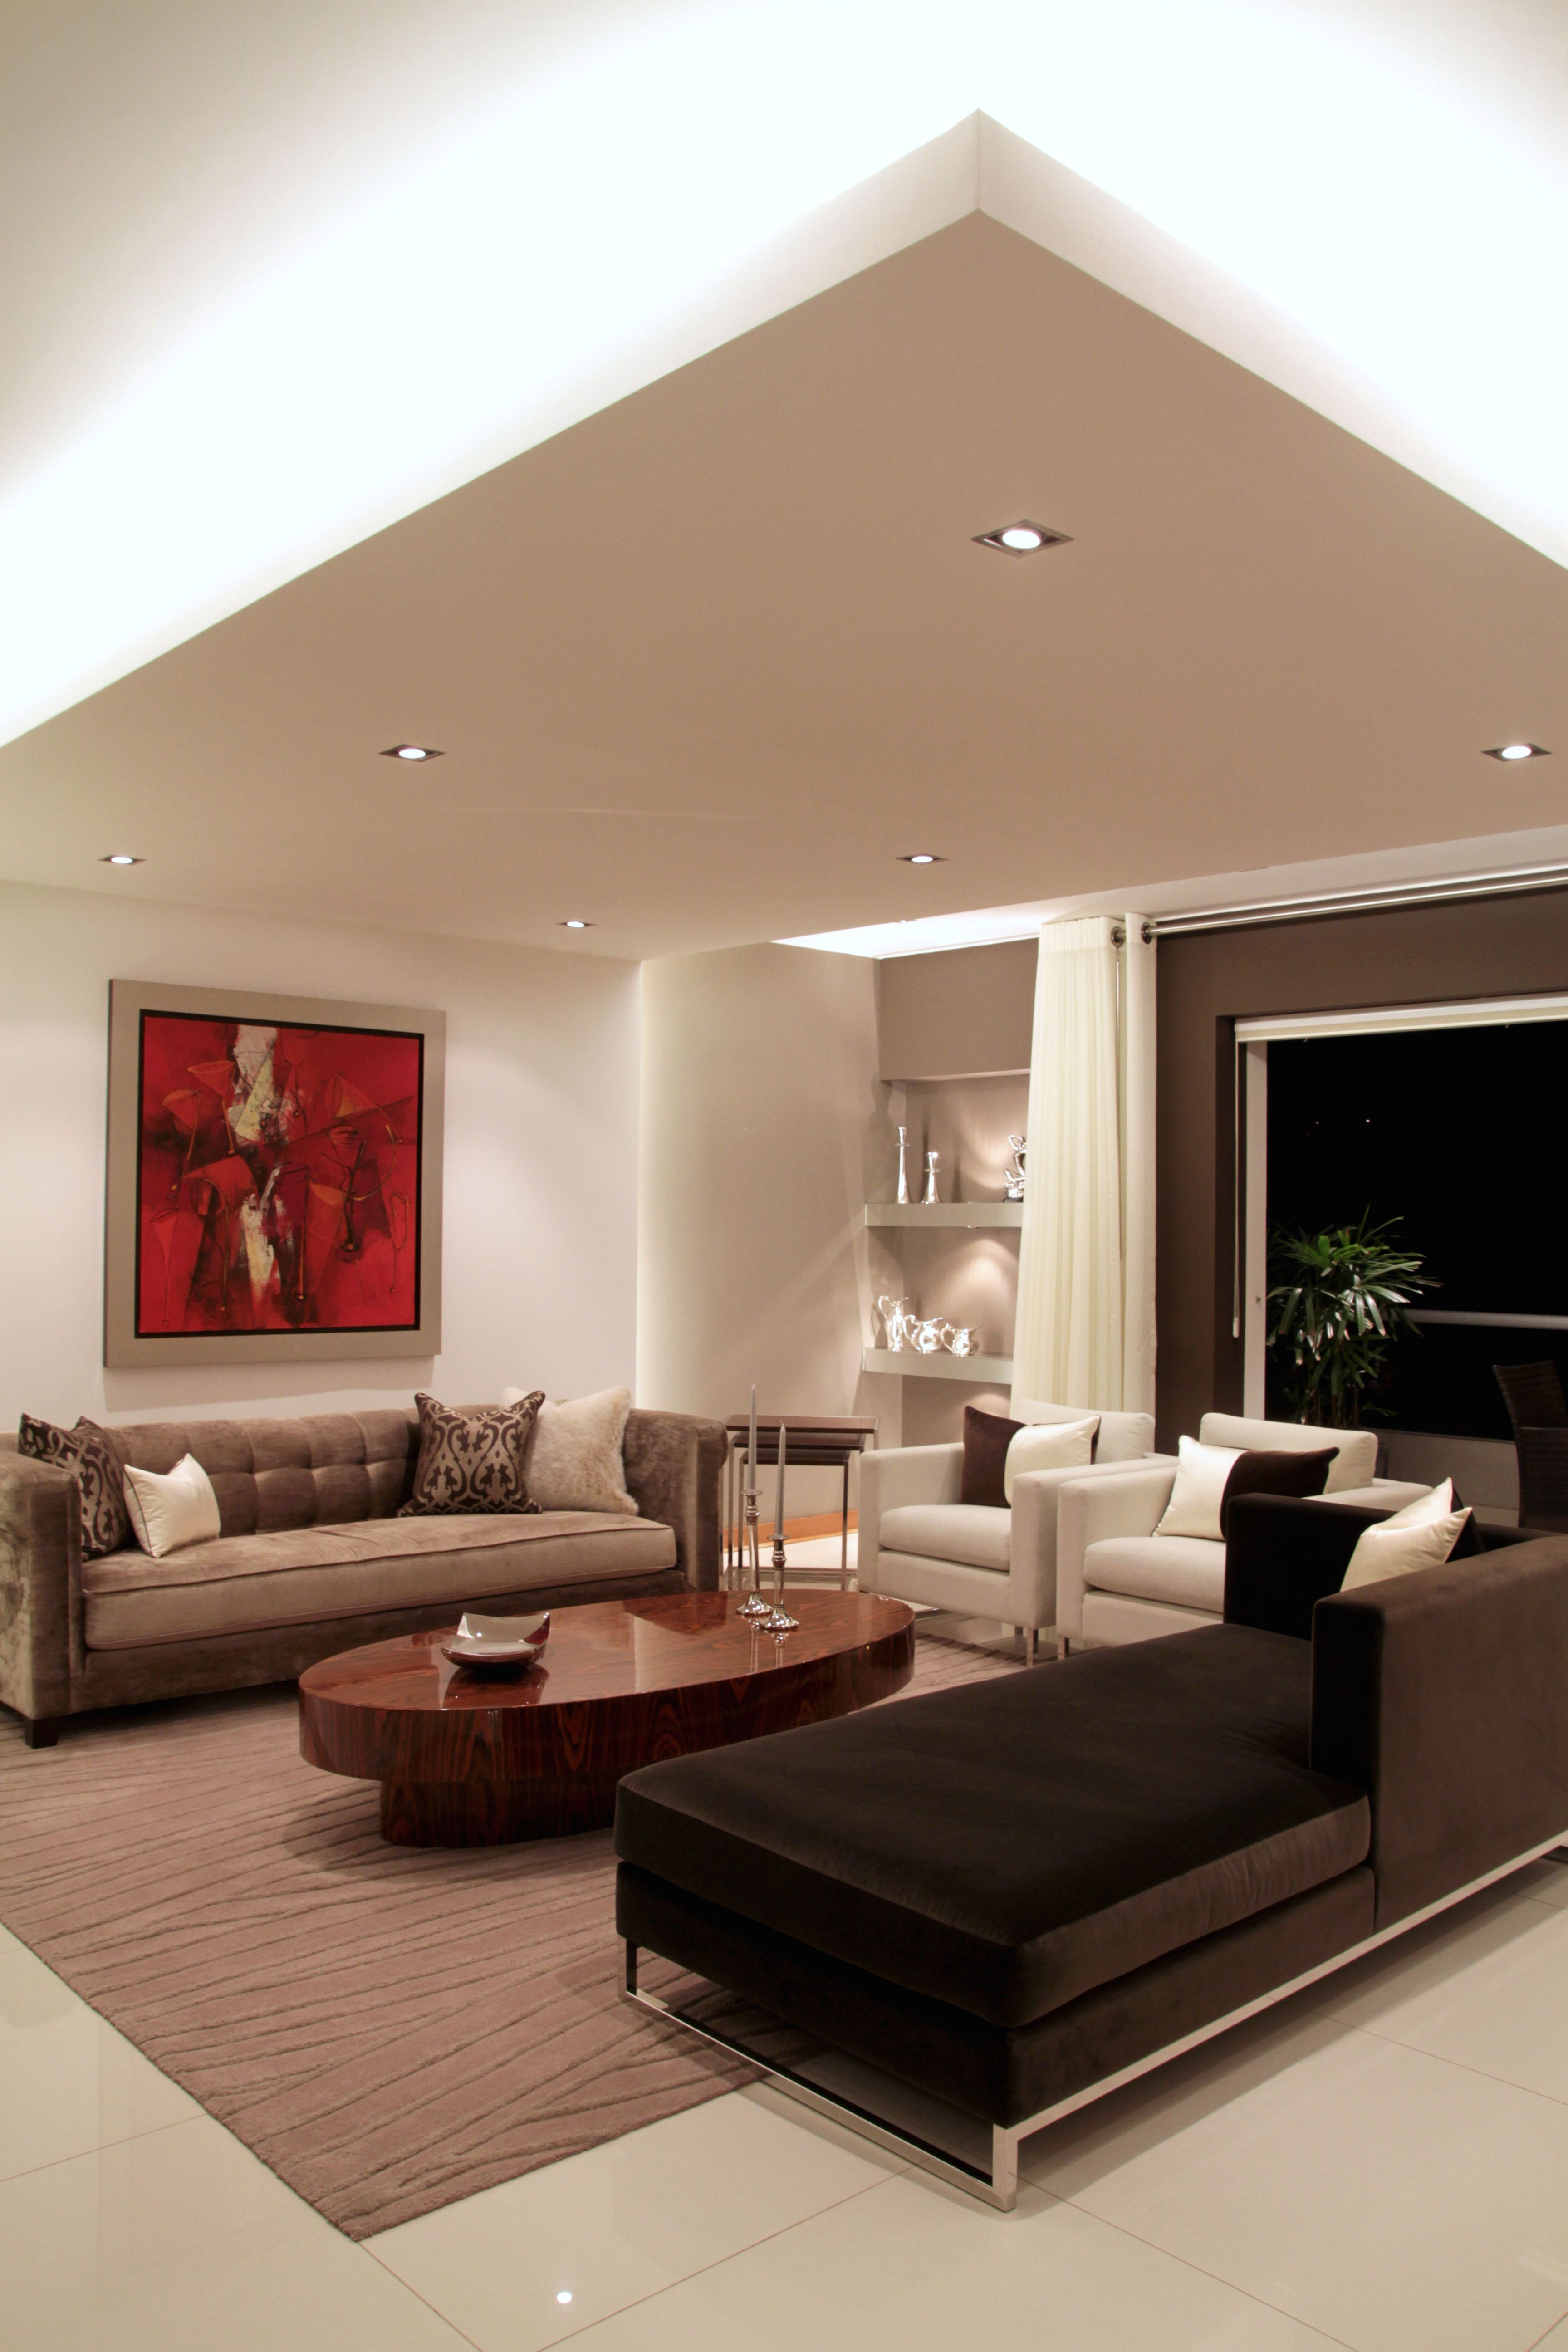 19 spectacular false ceiling design surround sound ideas